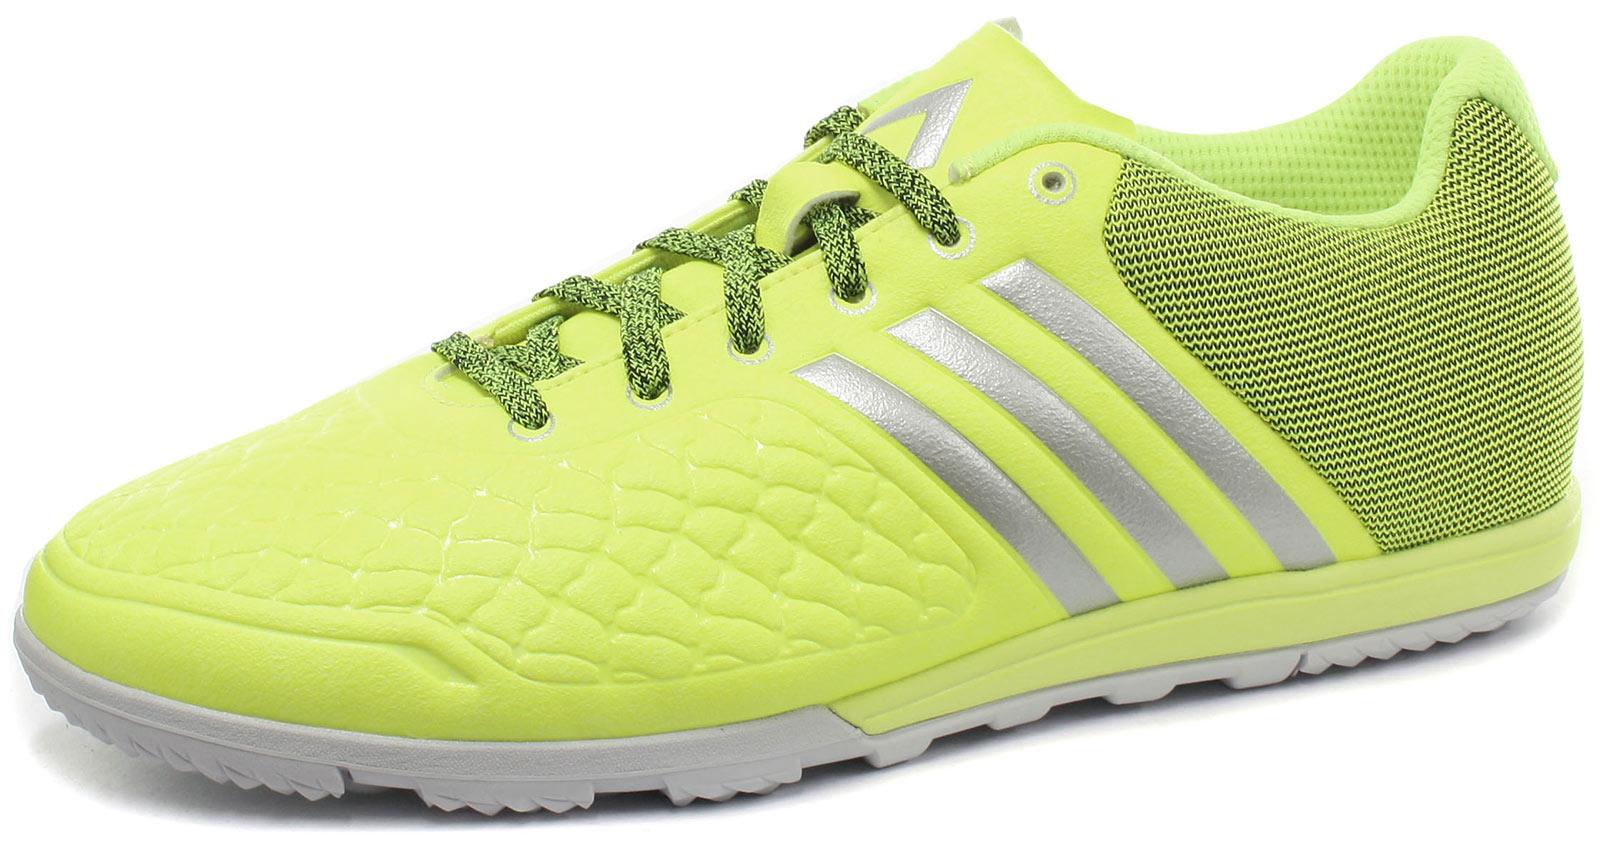 60bb97a5a New adidas Ace 16.2 FG/AG Mens Football Boots / Soccer Cleats ALL ...